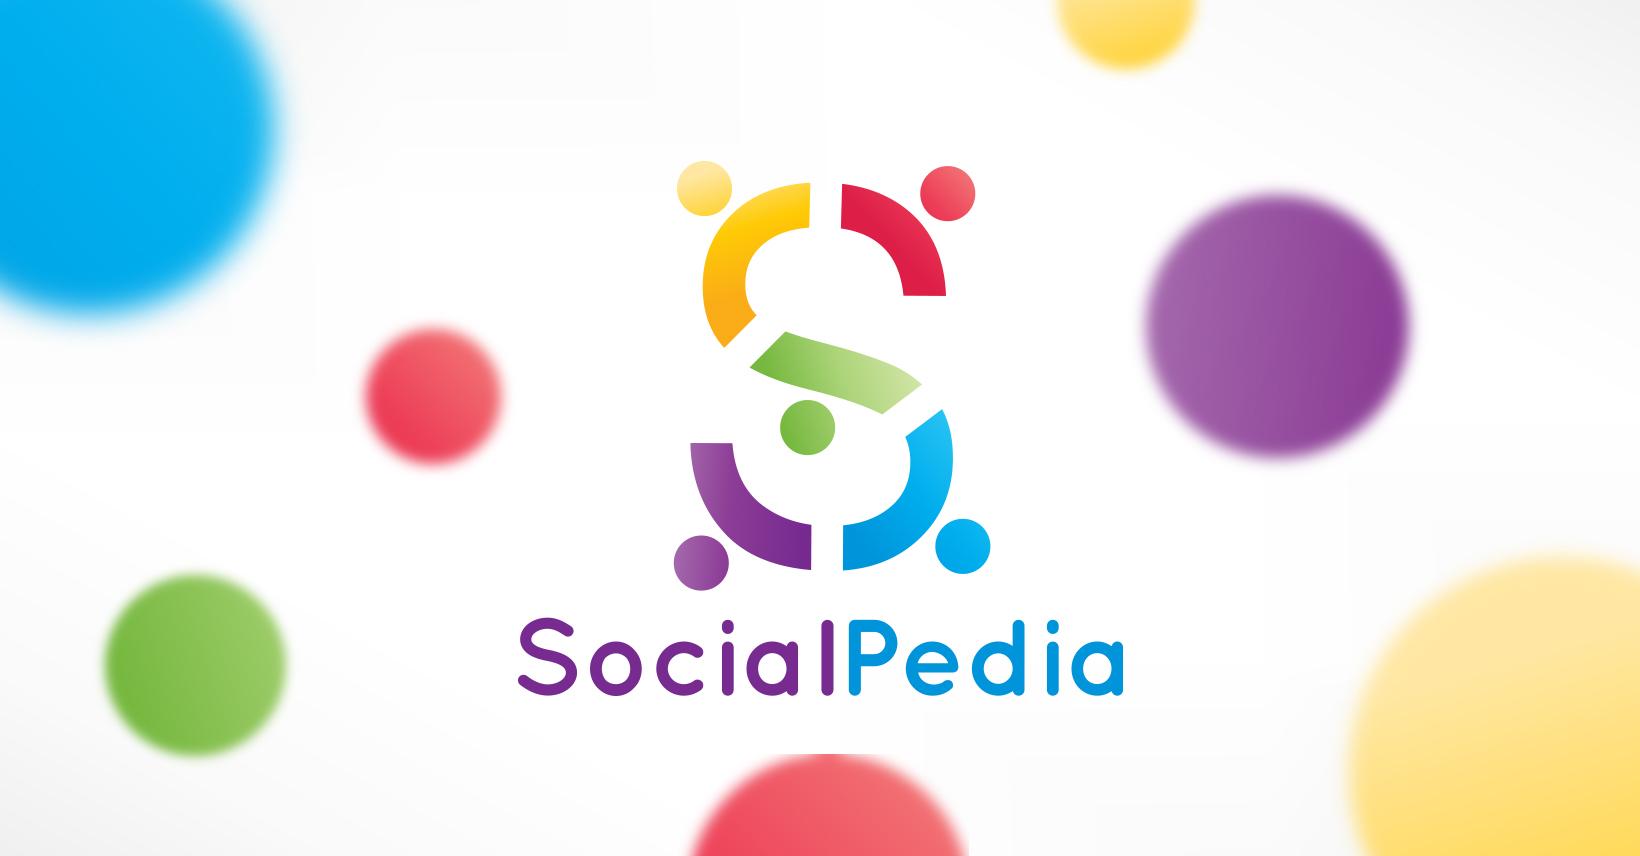 SocialPedia